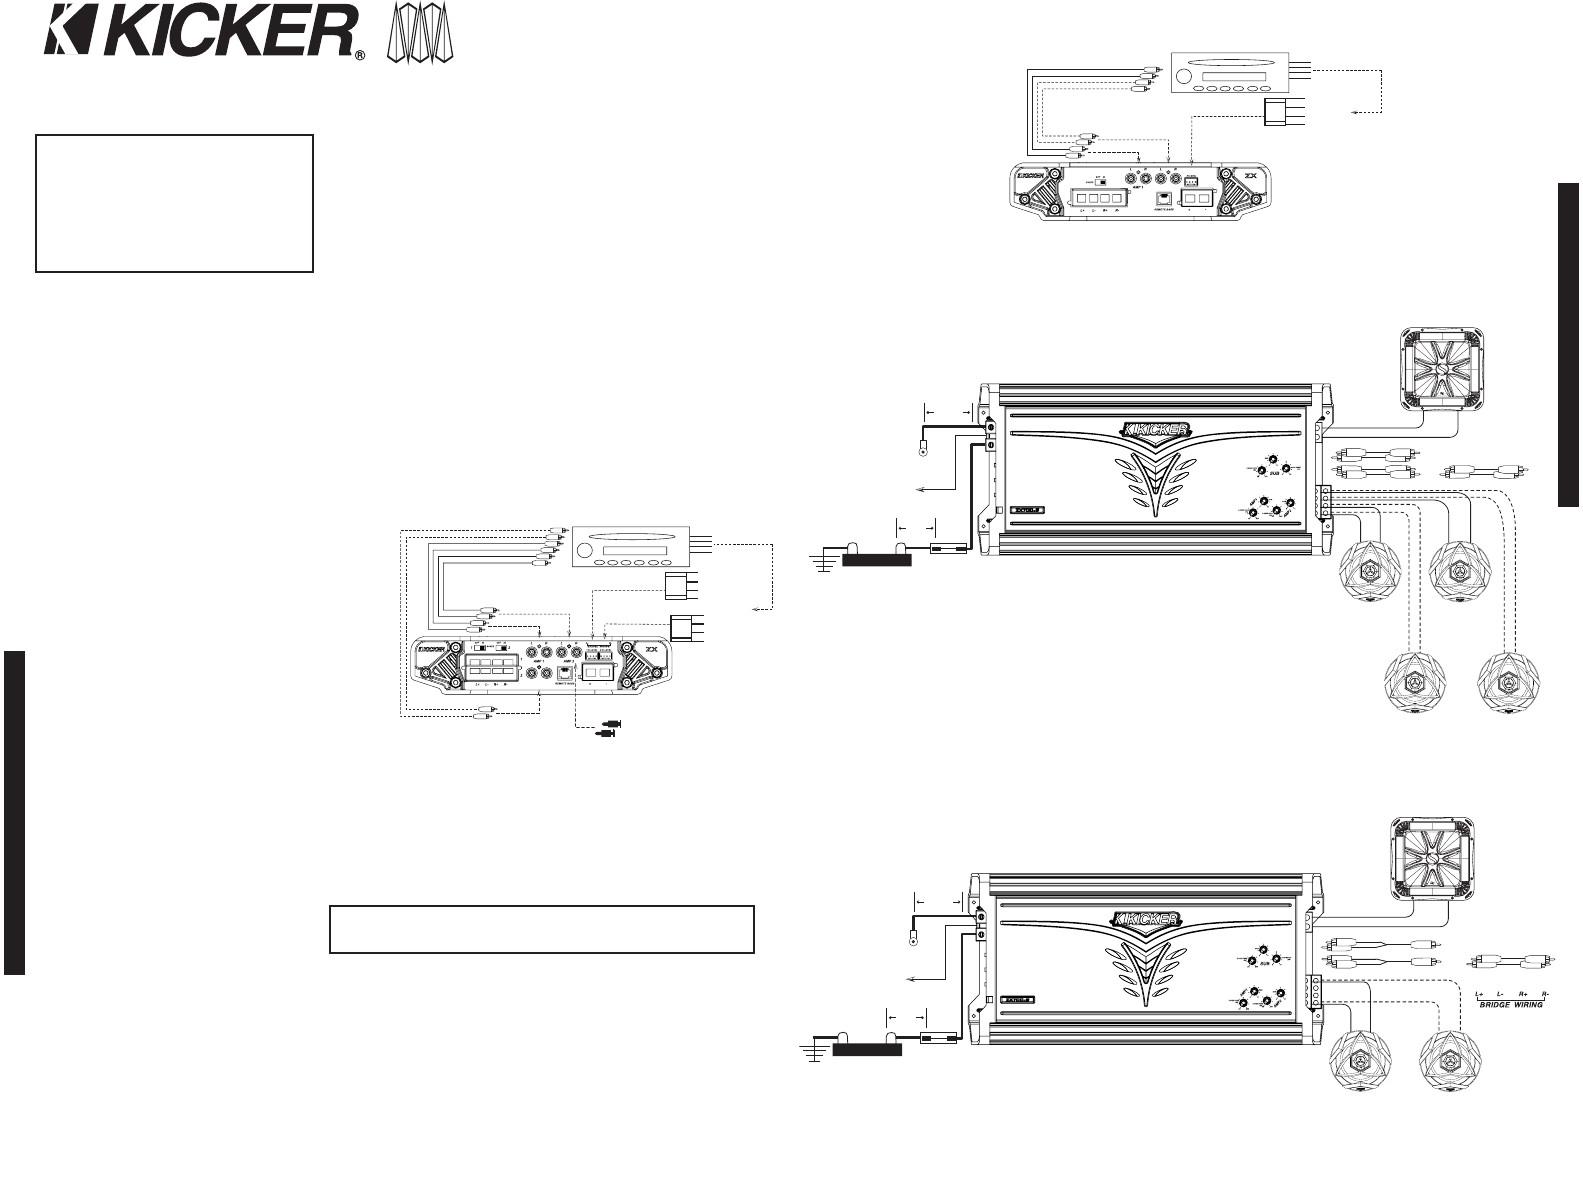 kicker wiring diagram svc